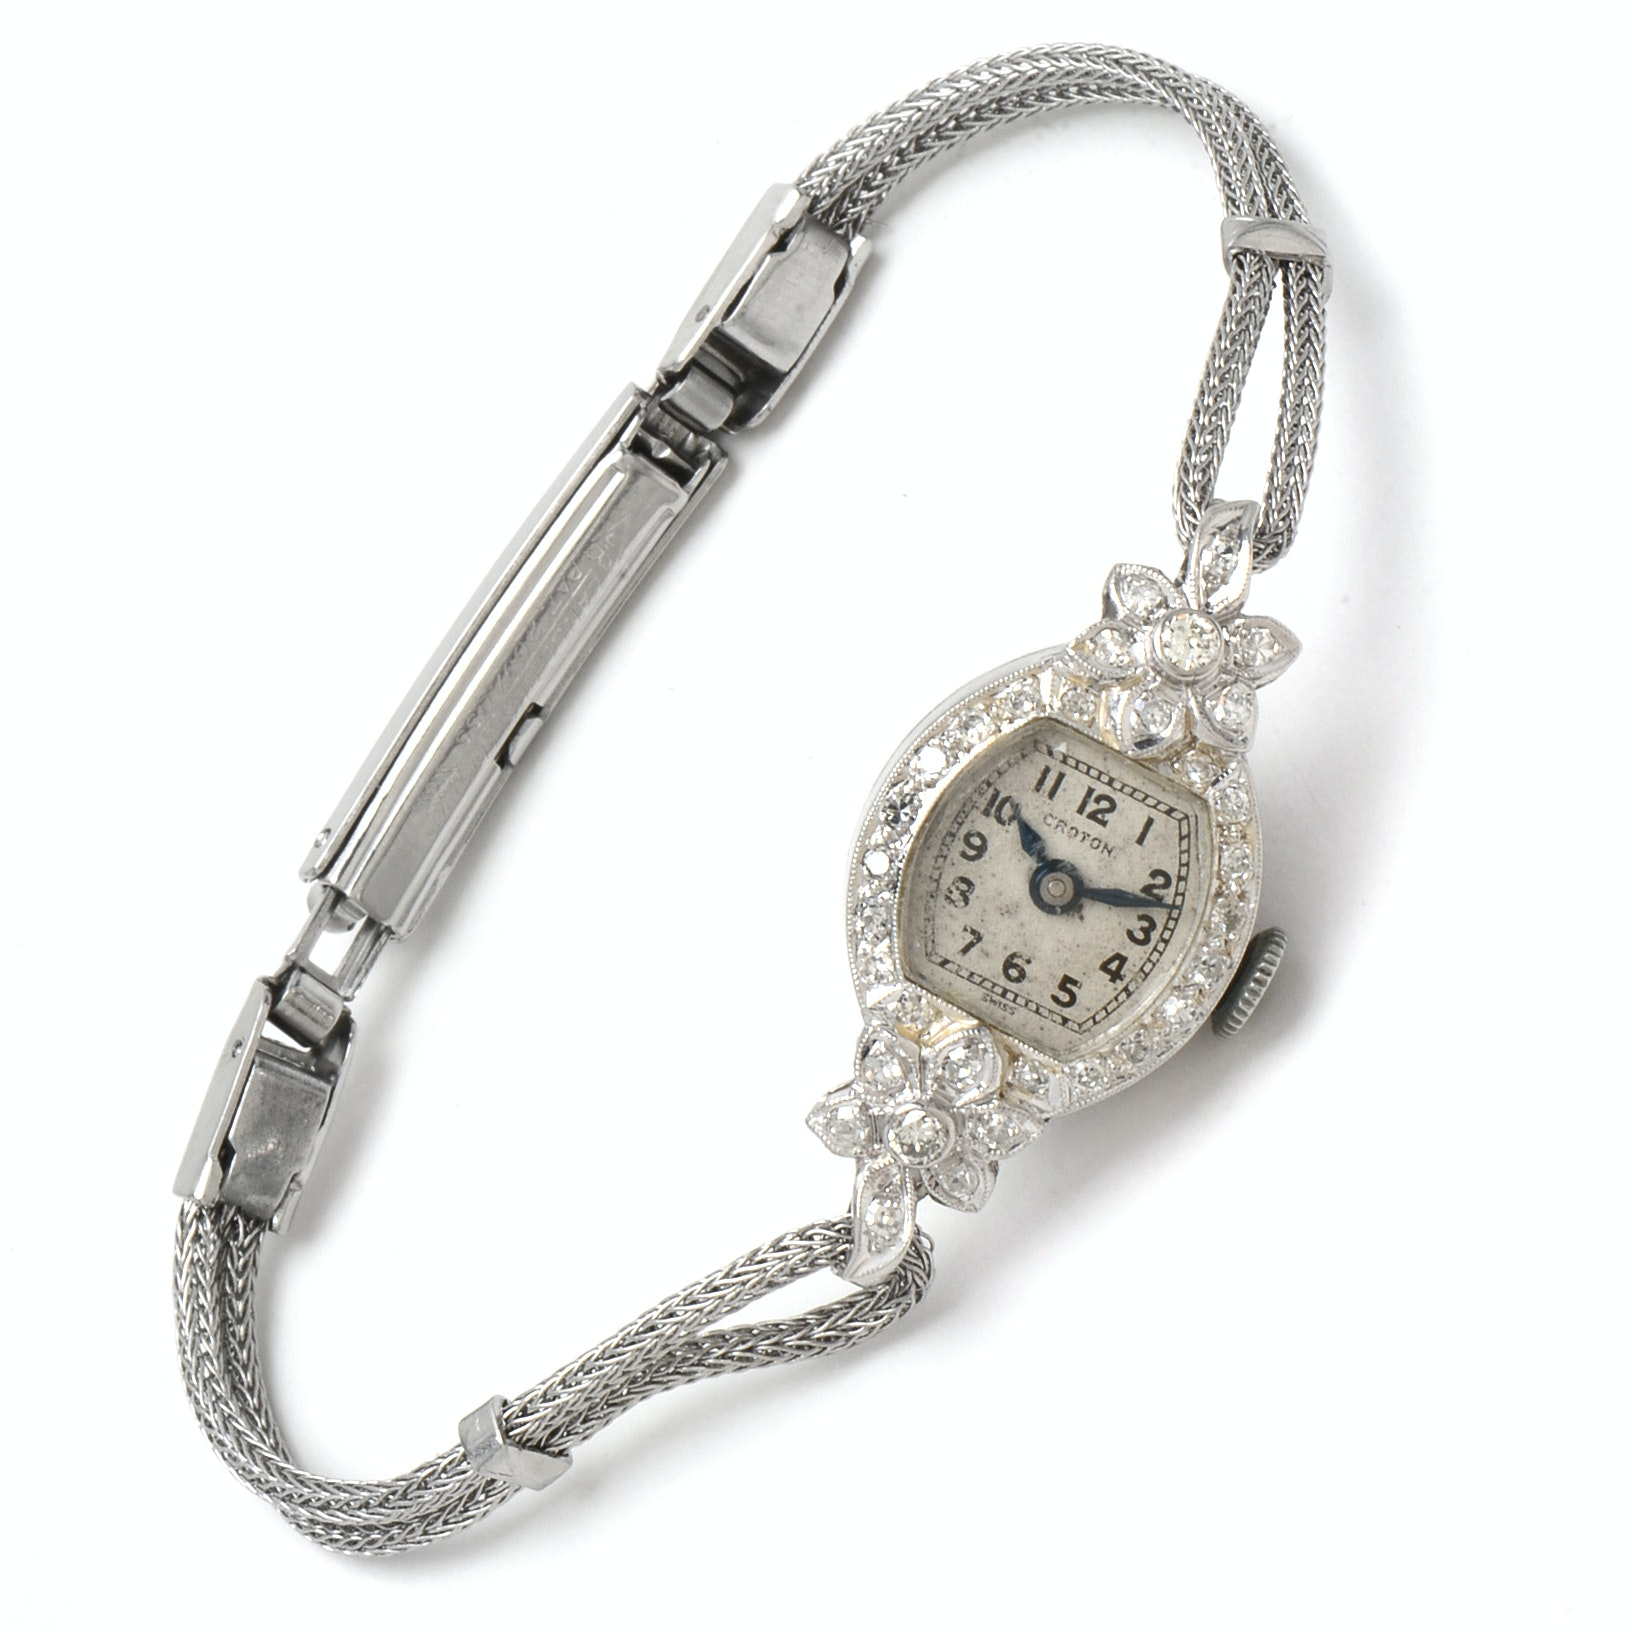 Platinum Croton Wristwatch with Diamond Floral Design